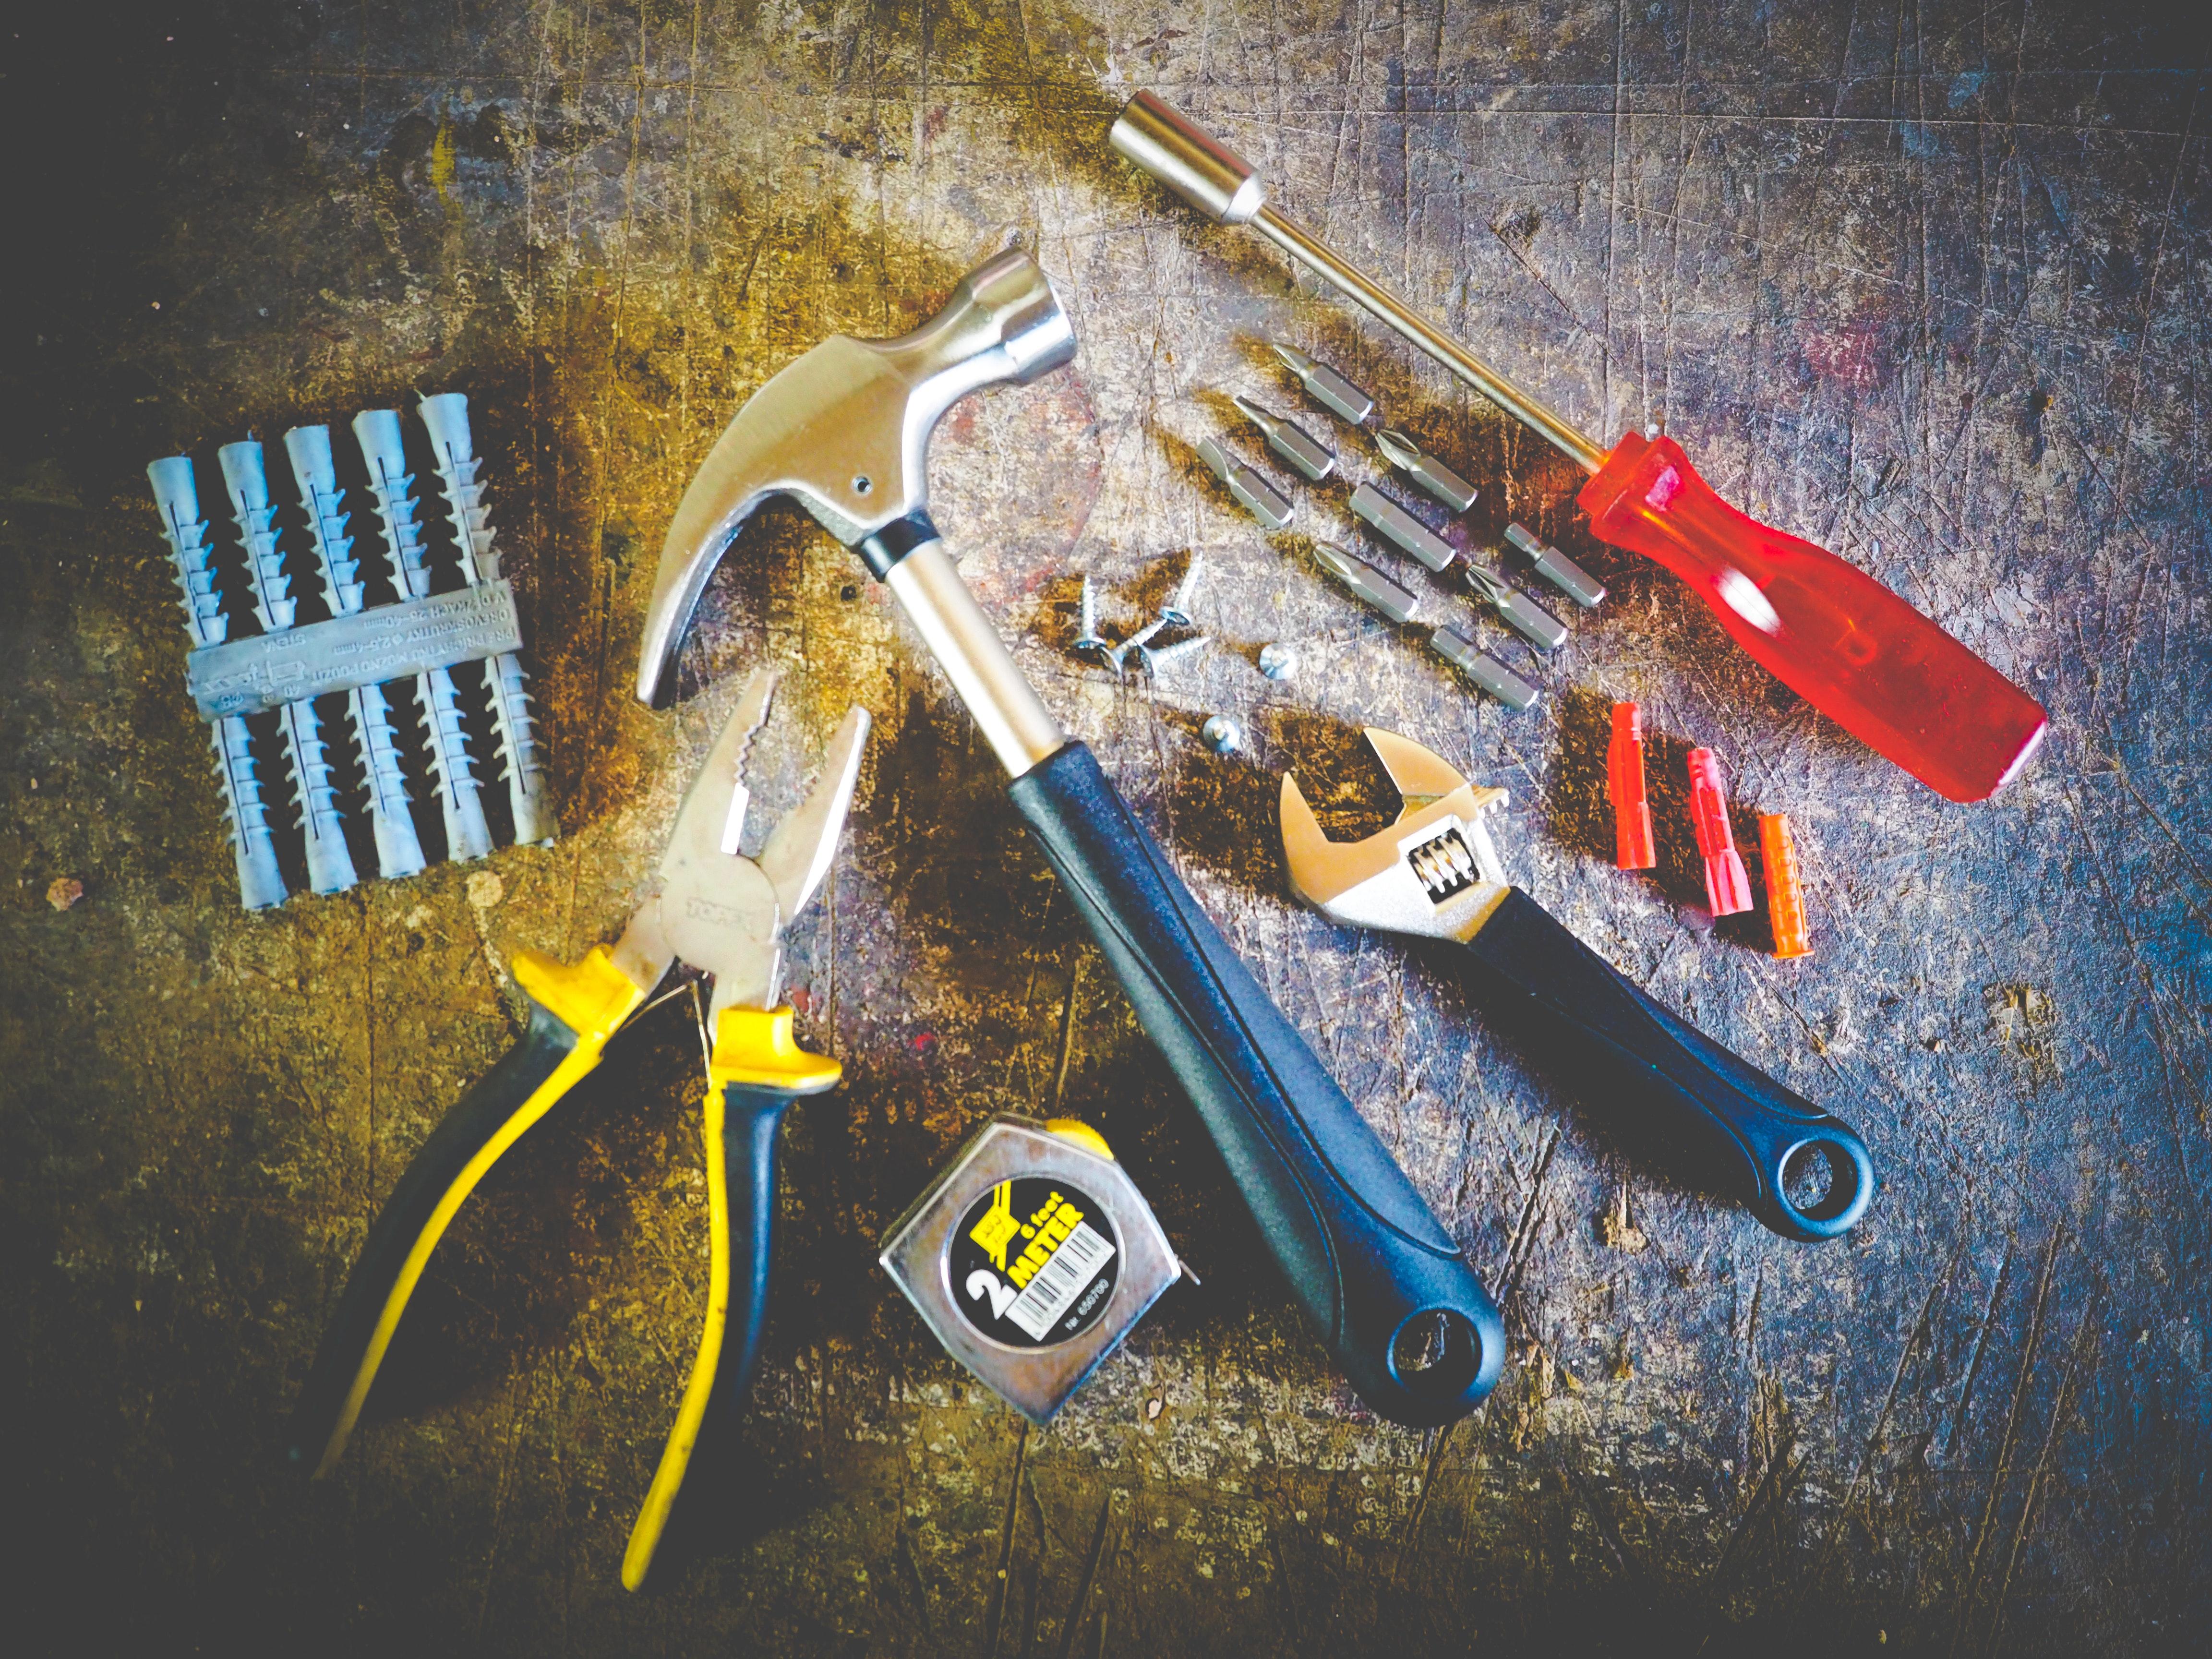 hammer-hand-tools-measuring-tape-175039 (1)